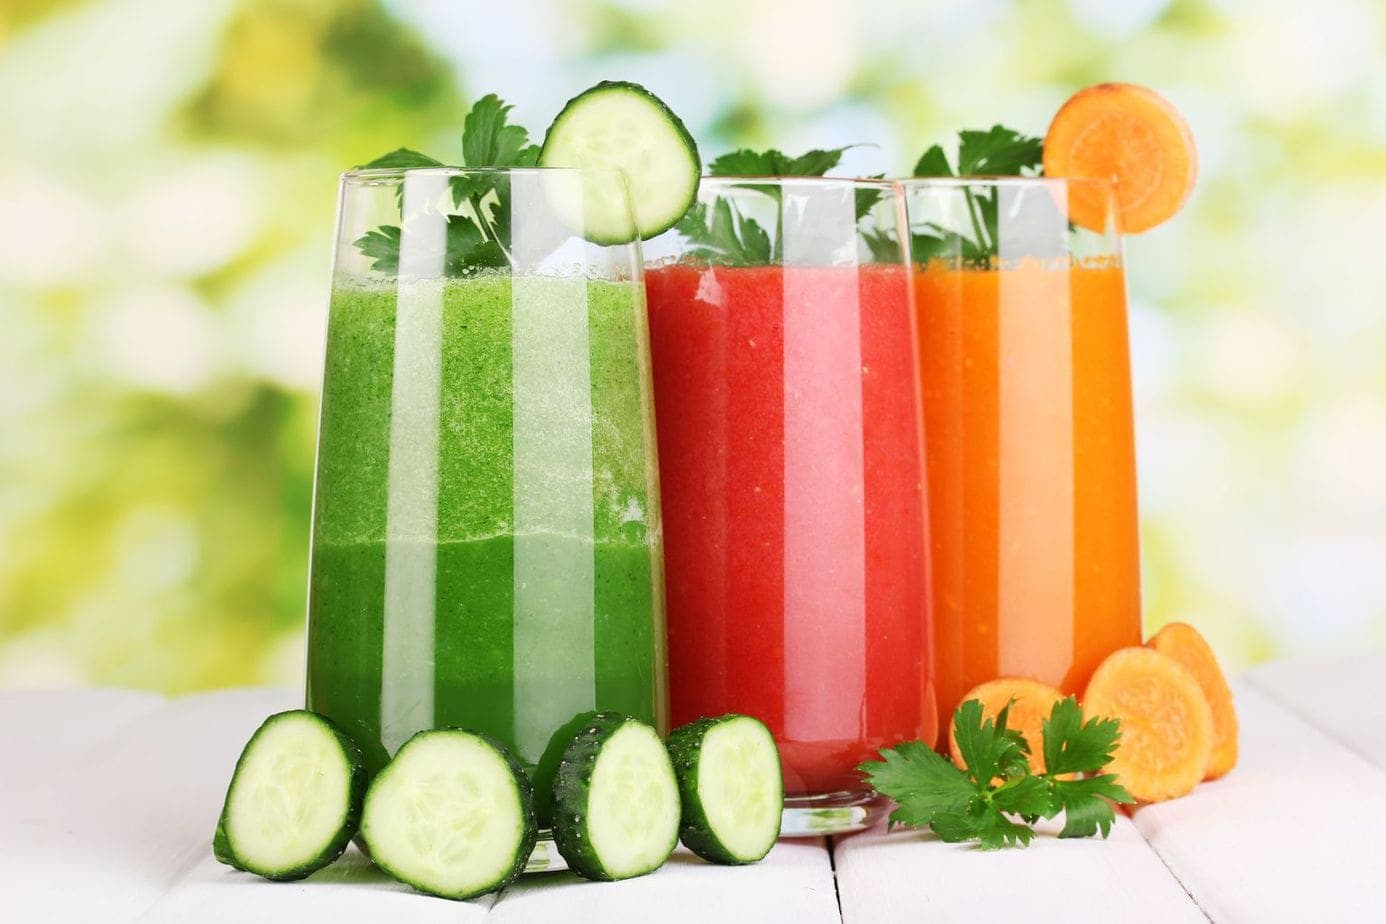 Detox juice recipe for detoxifying the liver